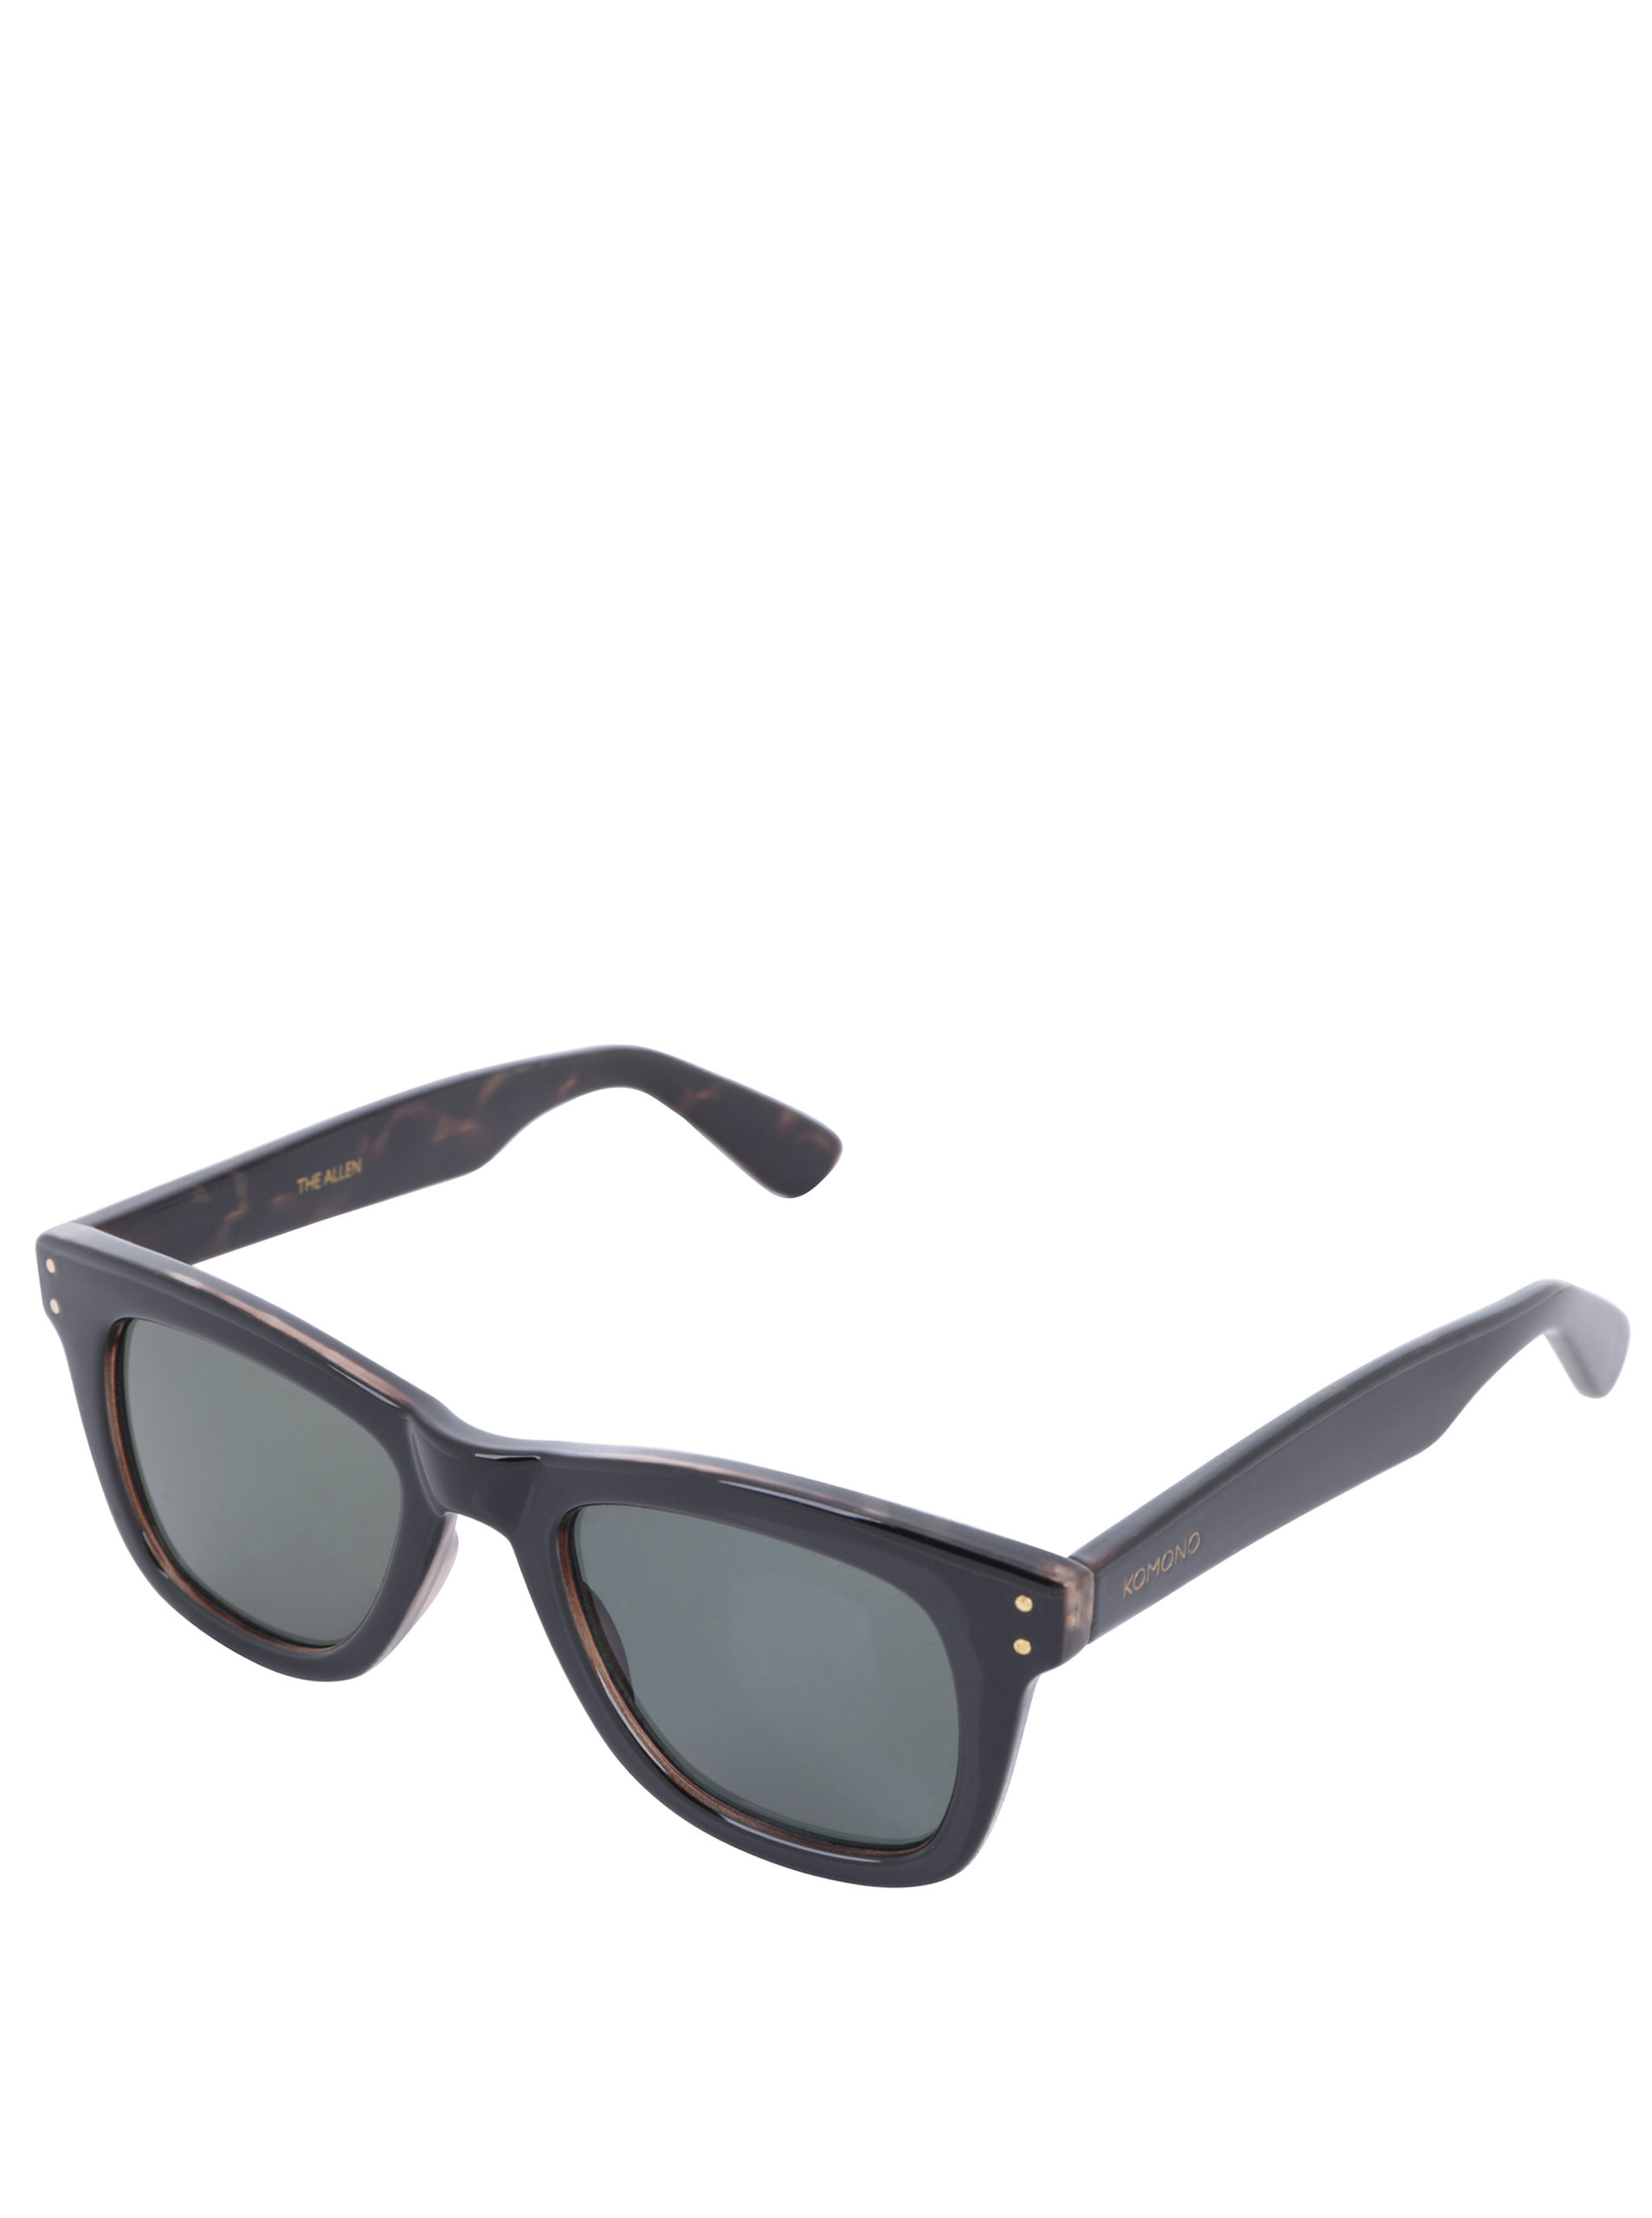 30f69bfcb Čierne unisex slnečné okuliare Komono Allen | ZOOT.sk